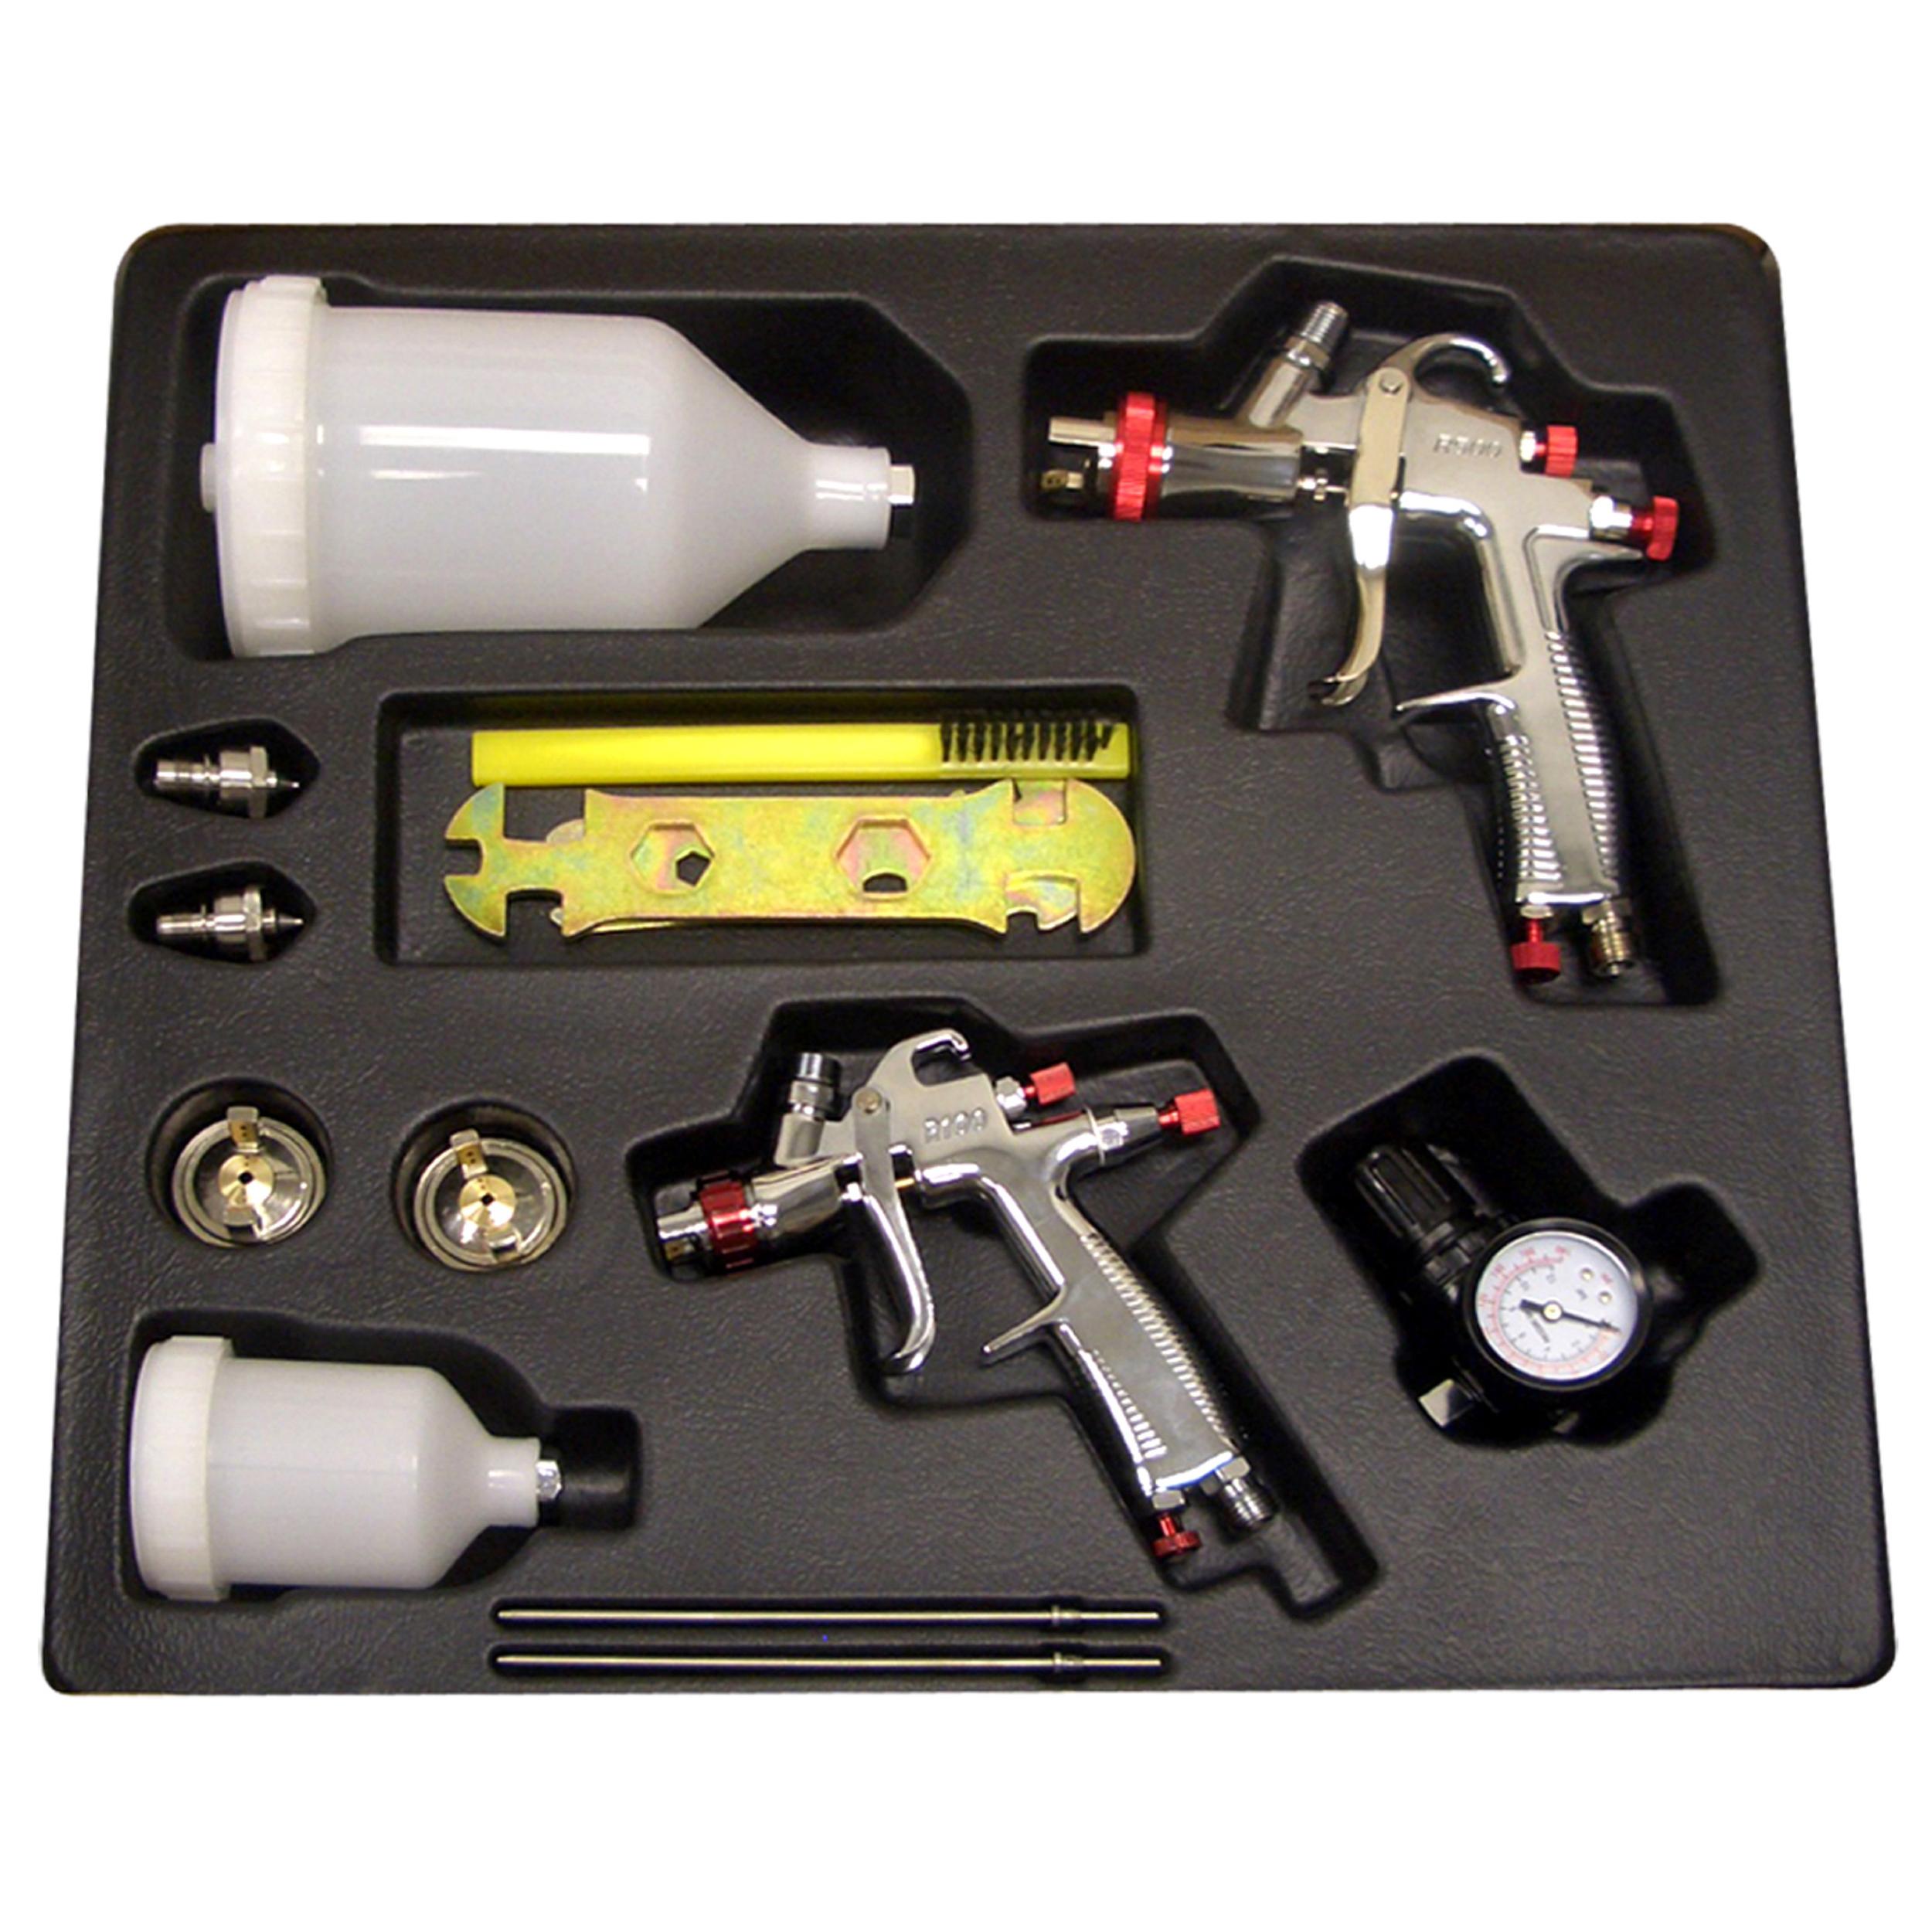 SP-33500 LVLP Gravity Feed Spray Gun Kit